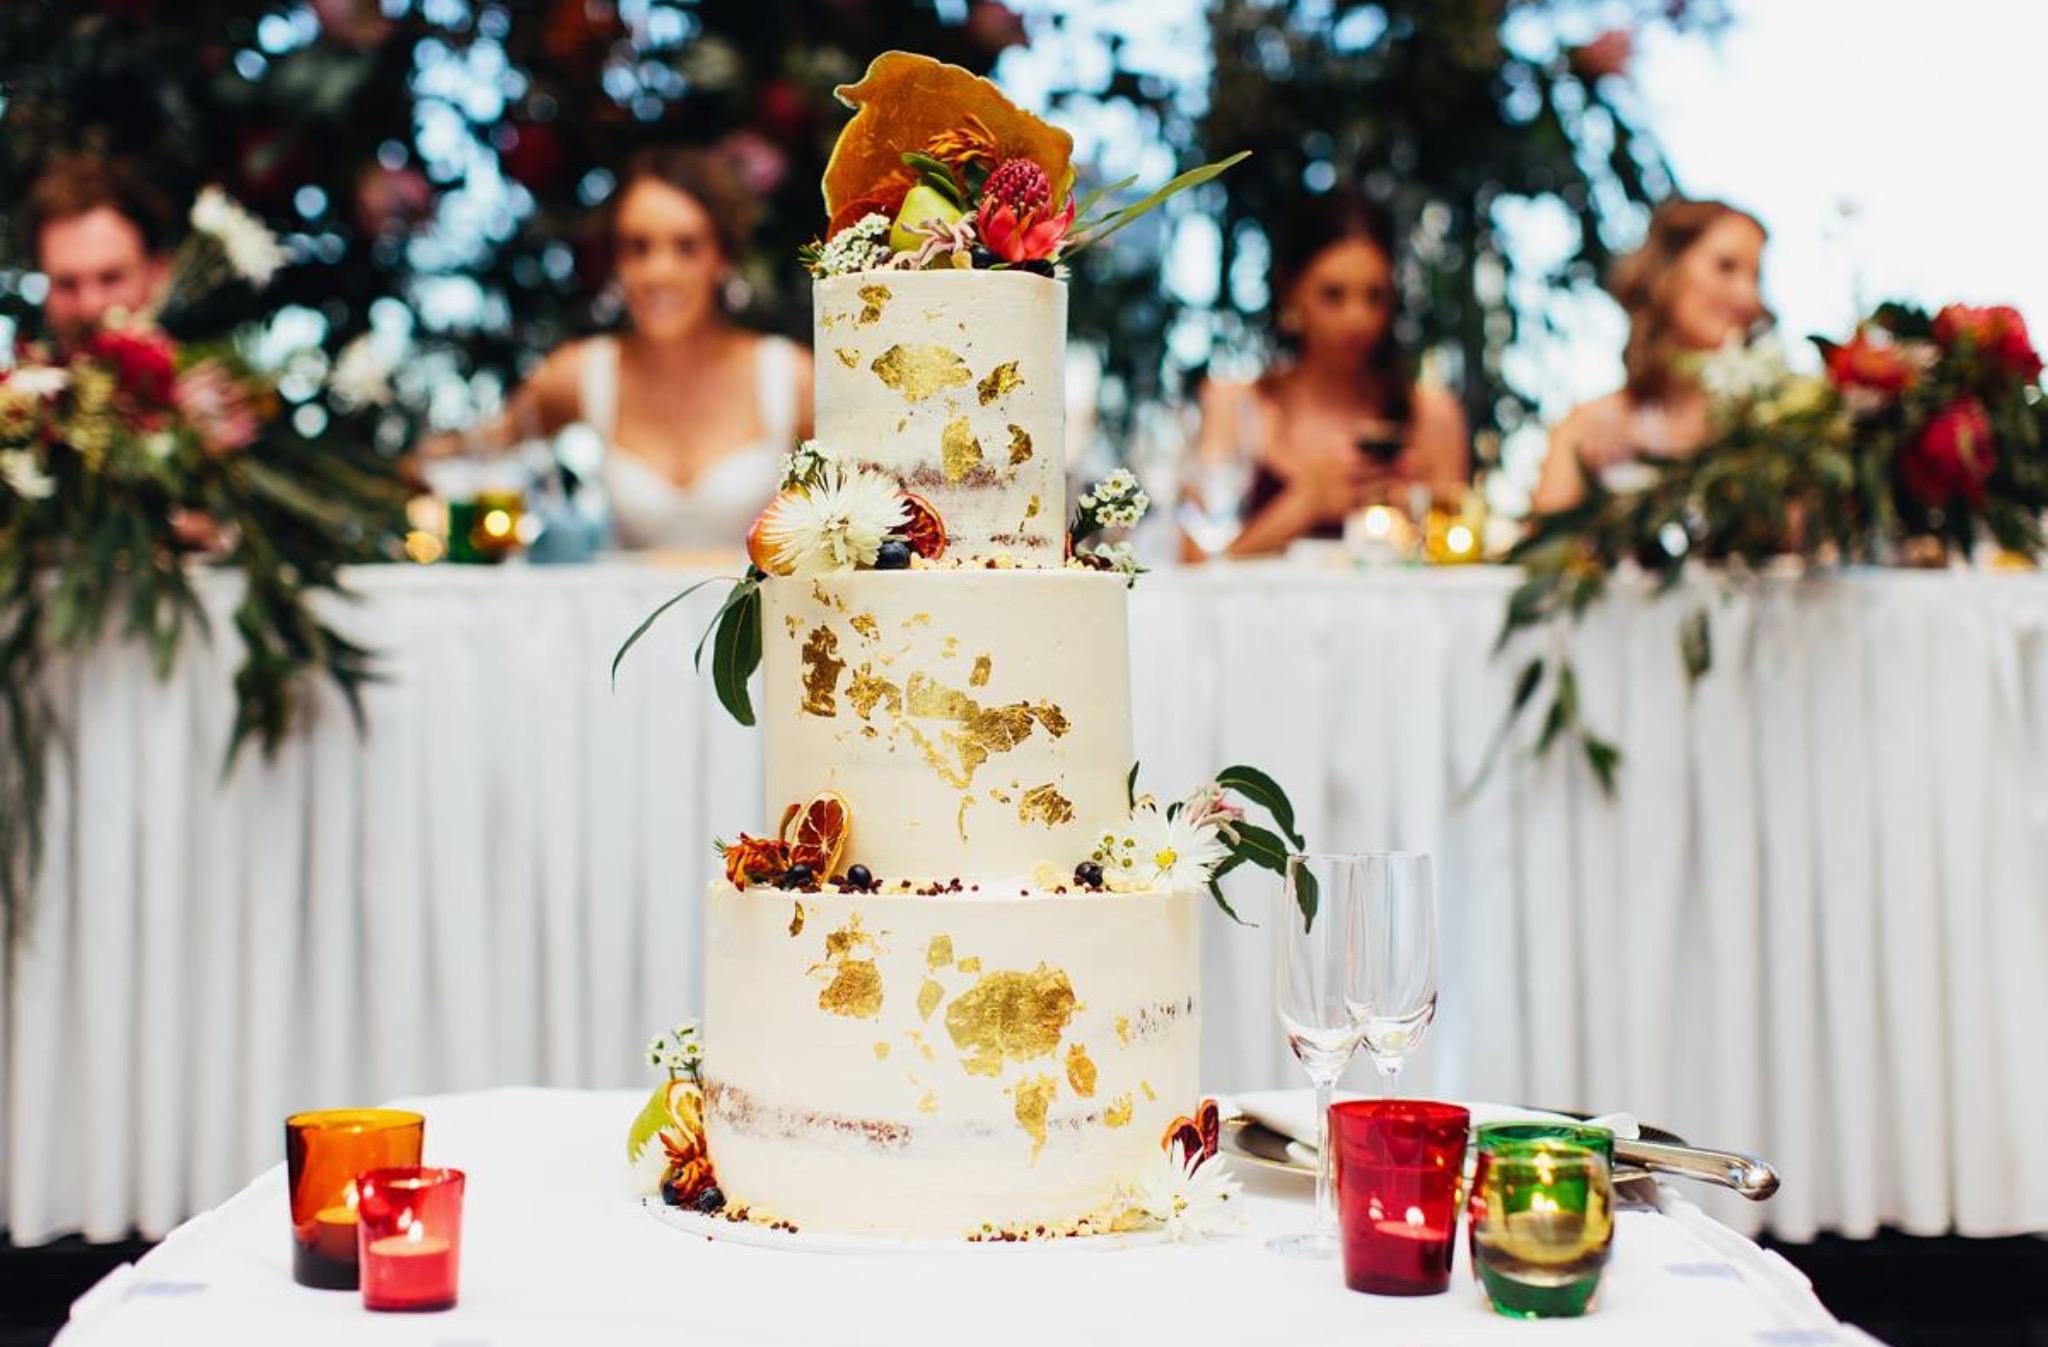 Copy of bespoke melbourne wedding cake